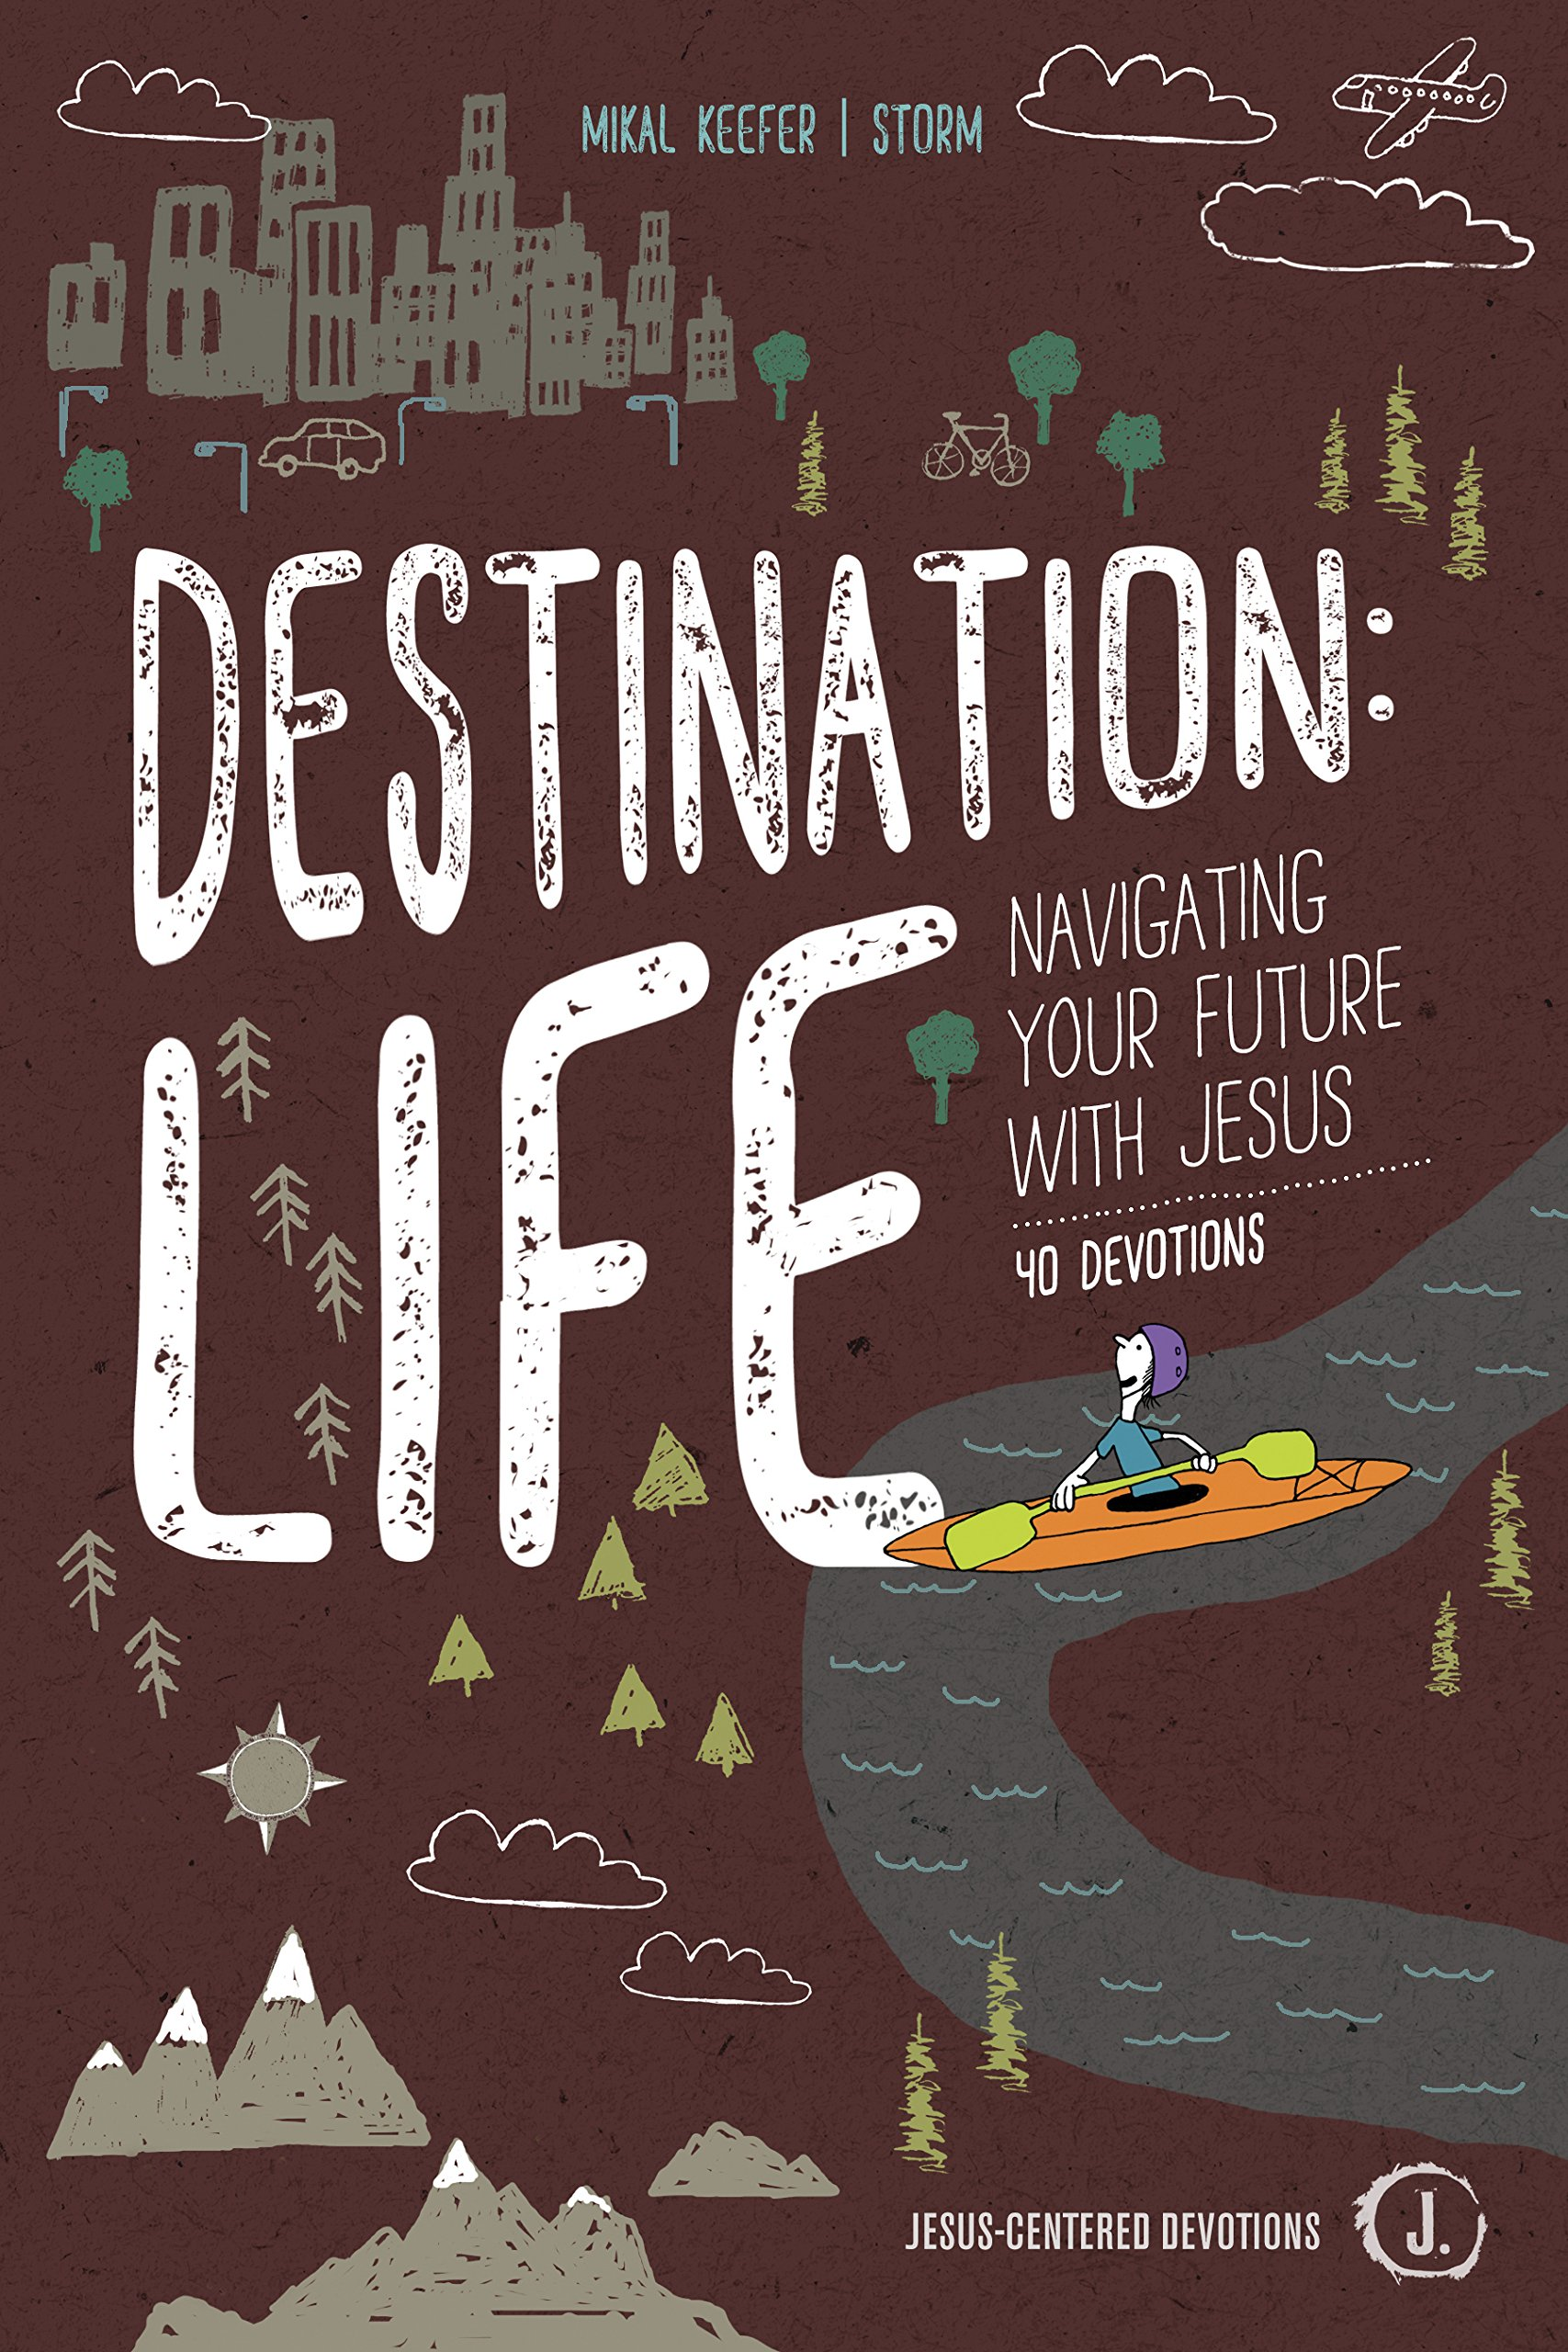 Amazon.com: Destination: Life: Navigating Your Future With Jesus (Jesus-Centered  Devotions) (9781470748449): Mikal Keefer, Jeff Storm: Books